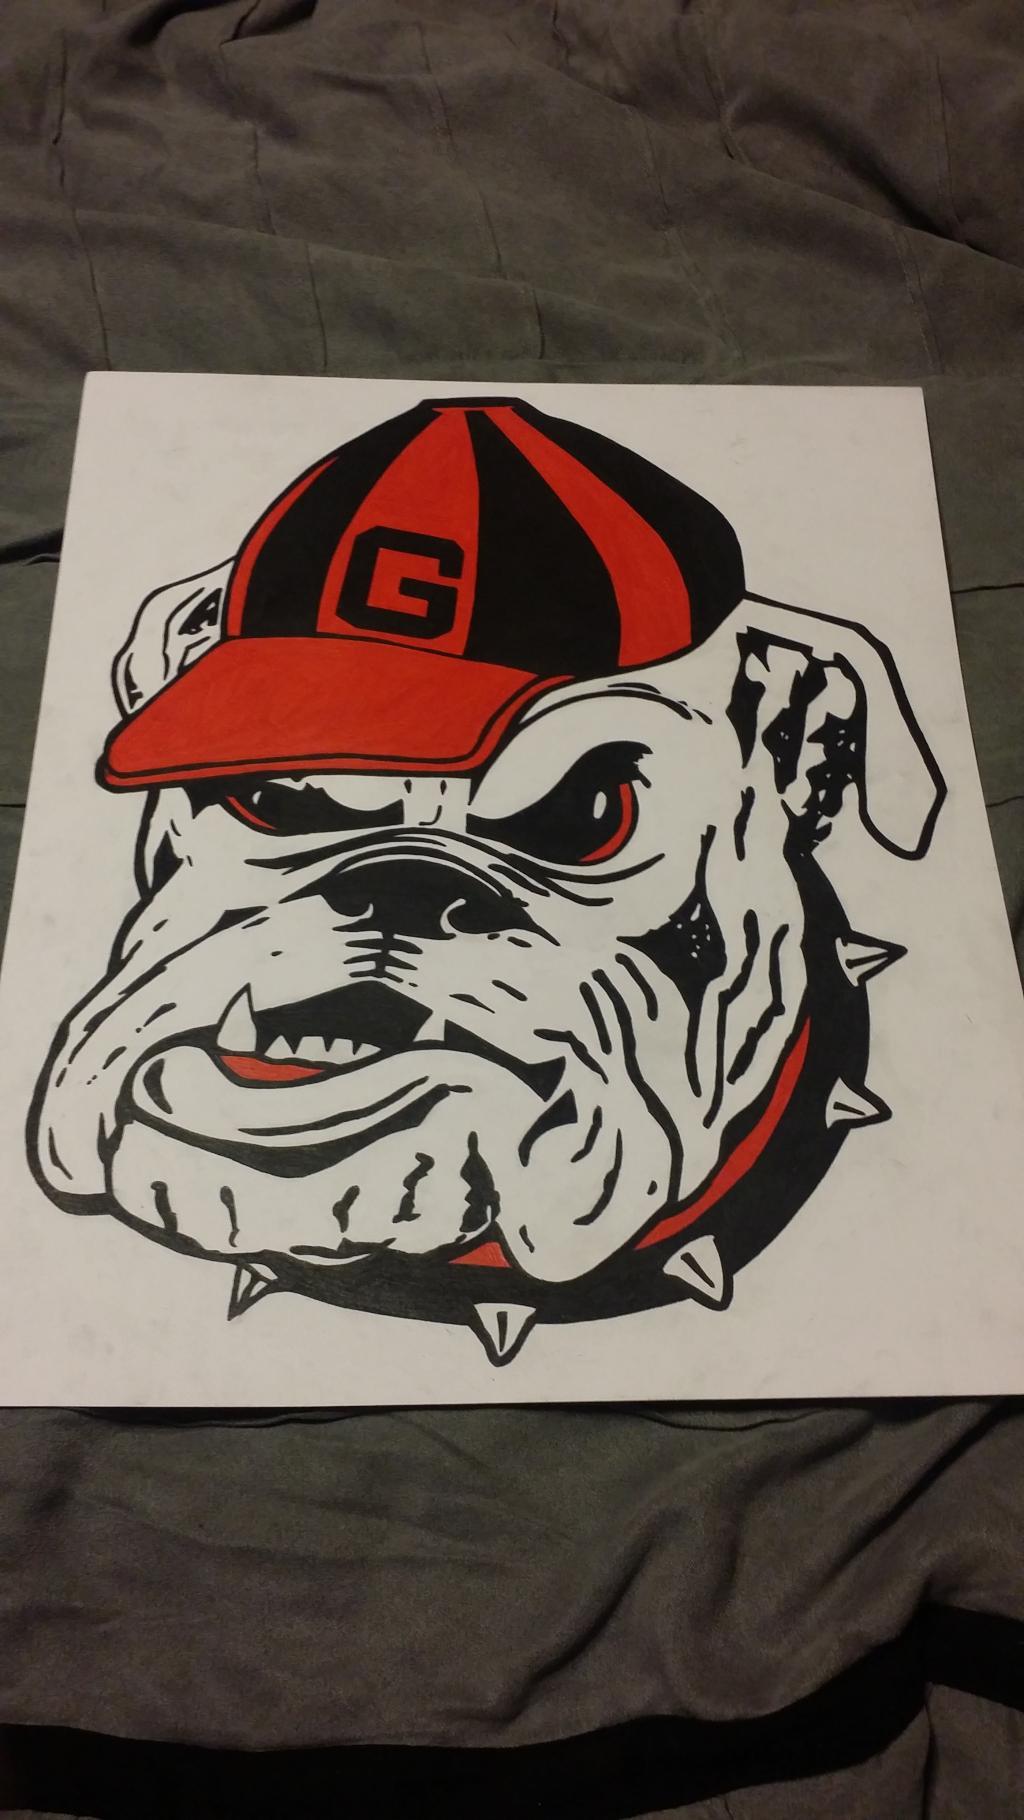 1024x1820 Georgia Bulldogs Logo Natep0212 Foundmyself